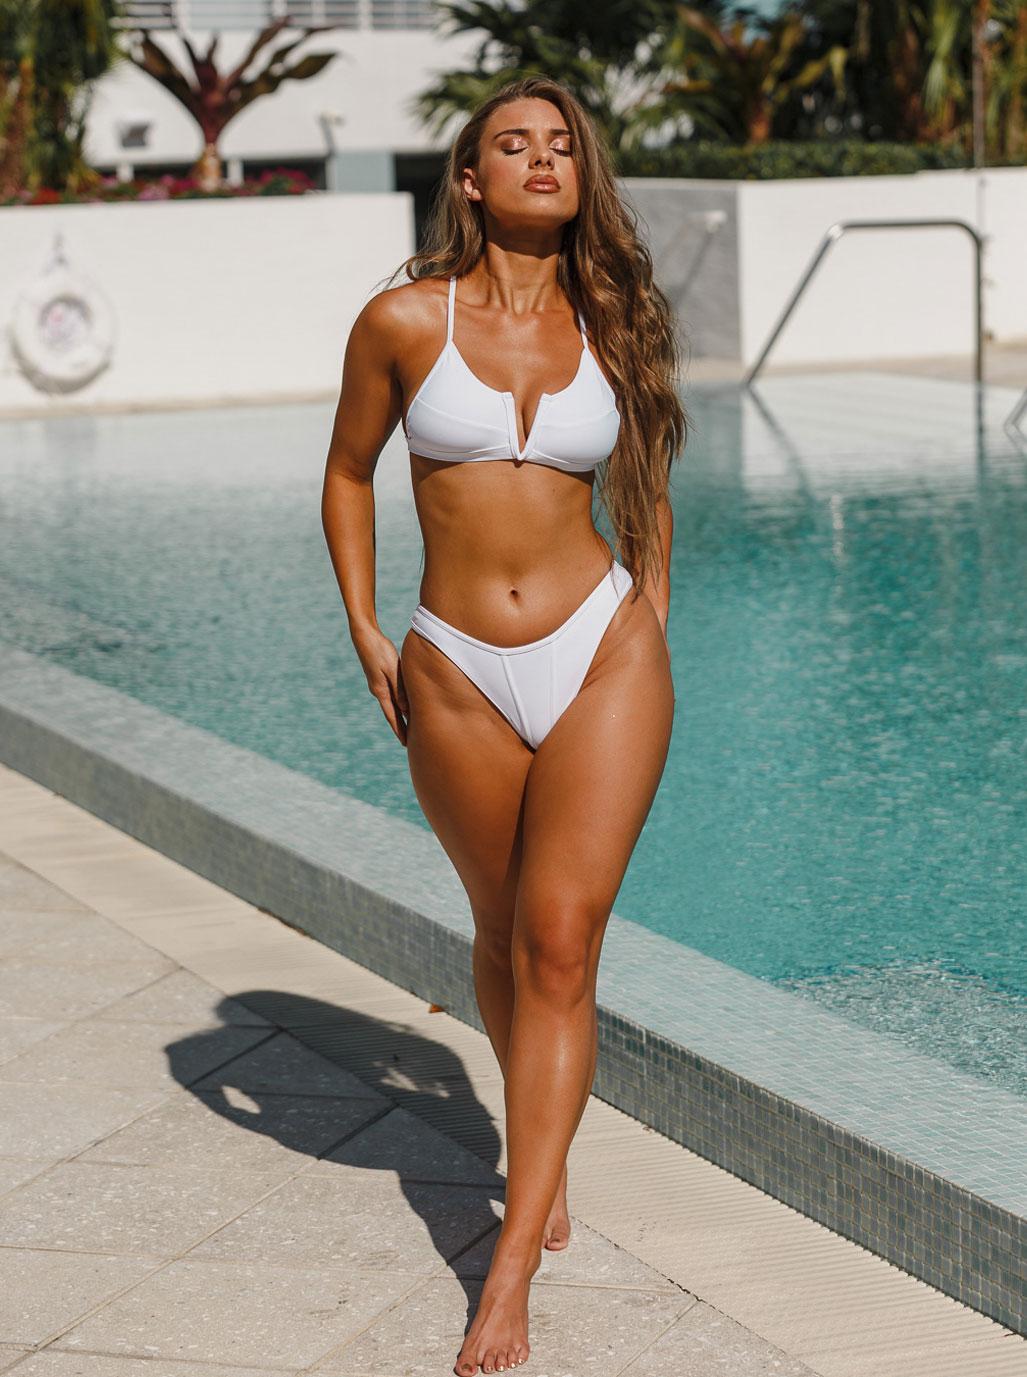 купальники большого размера на девушке формата плюс / Avalon Dawn by ISB Studios - Heartbreaker Swimwear 2019